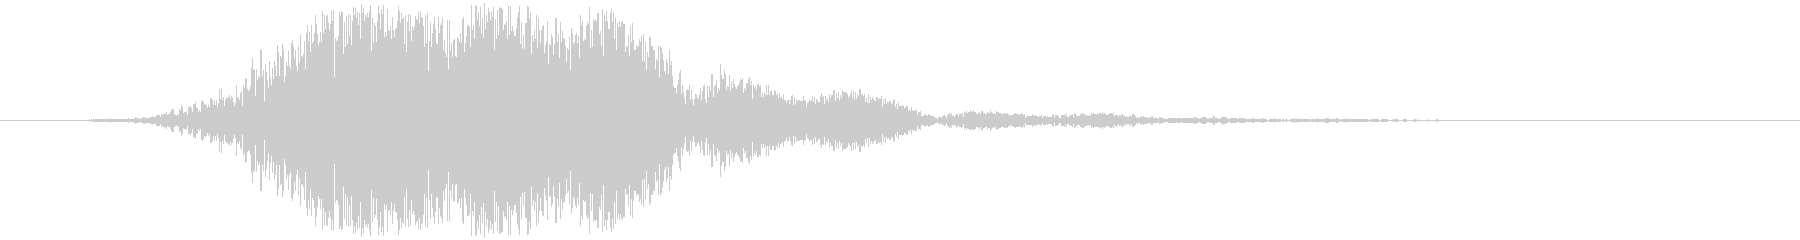 【SF】【SCI-FI】ヒューンッ・・・の未再生の波形